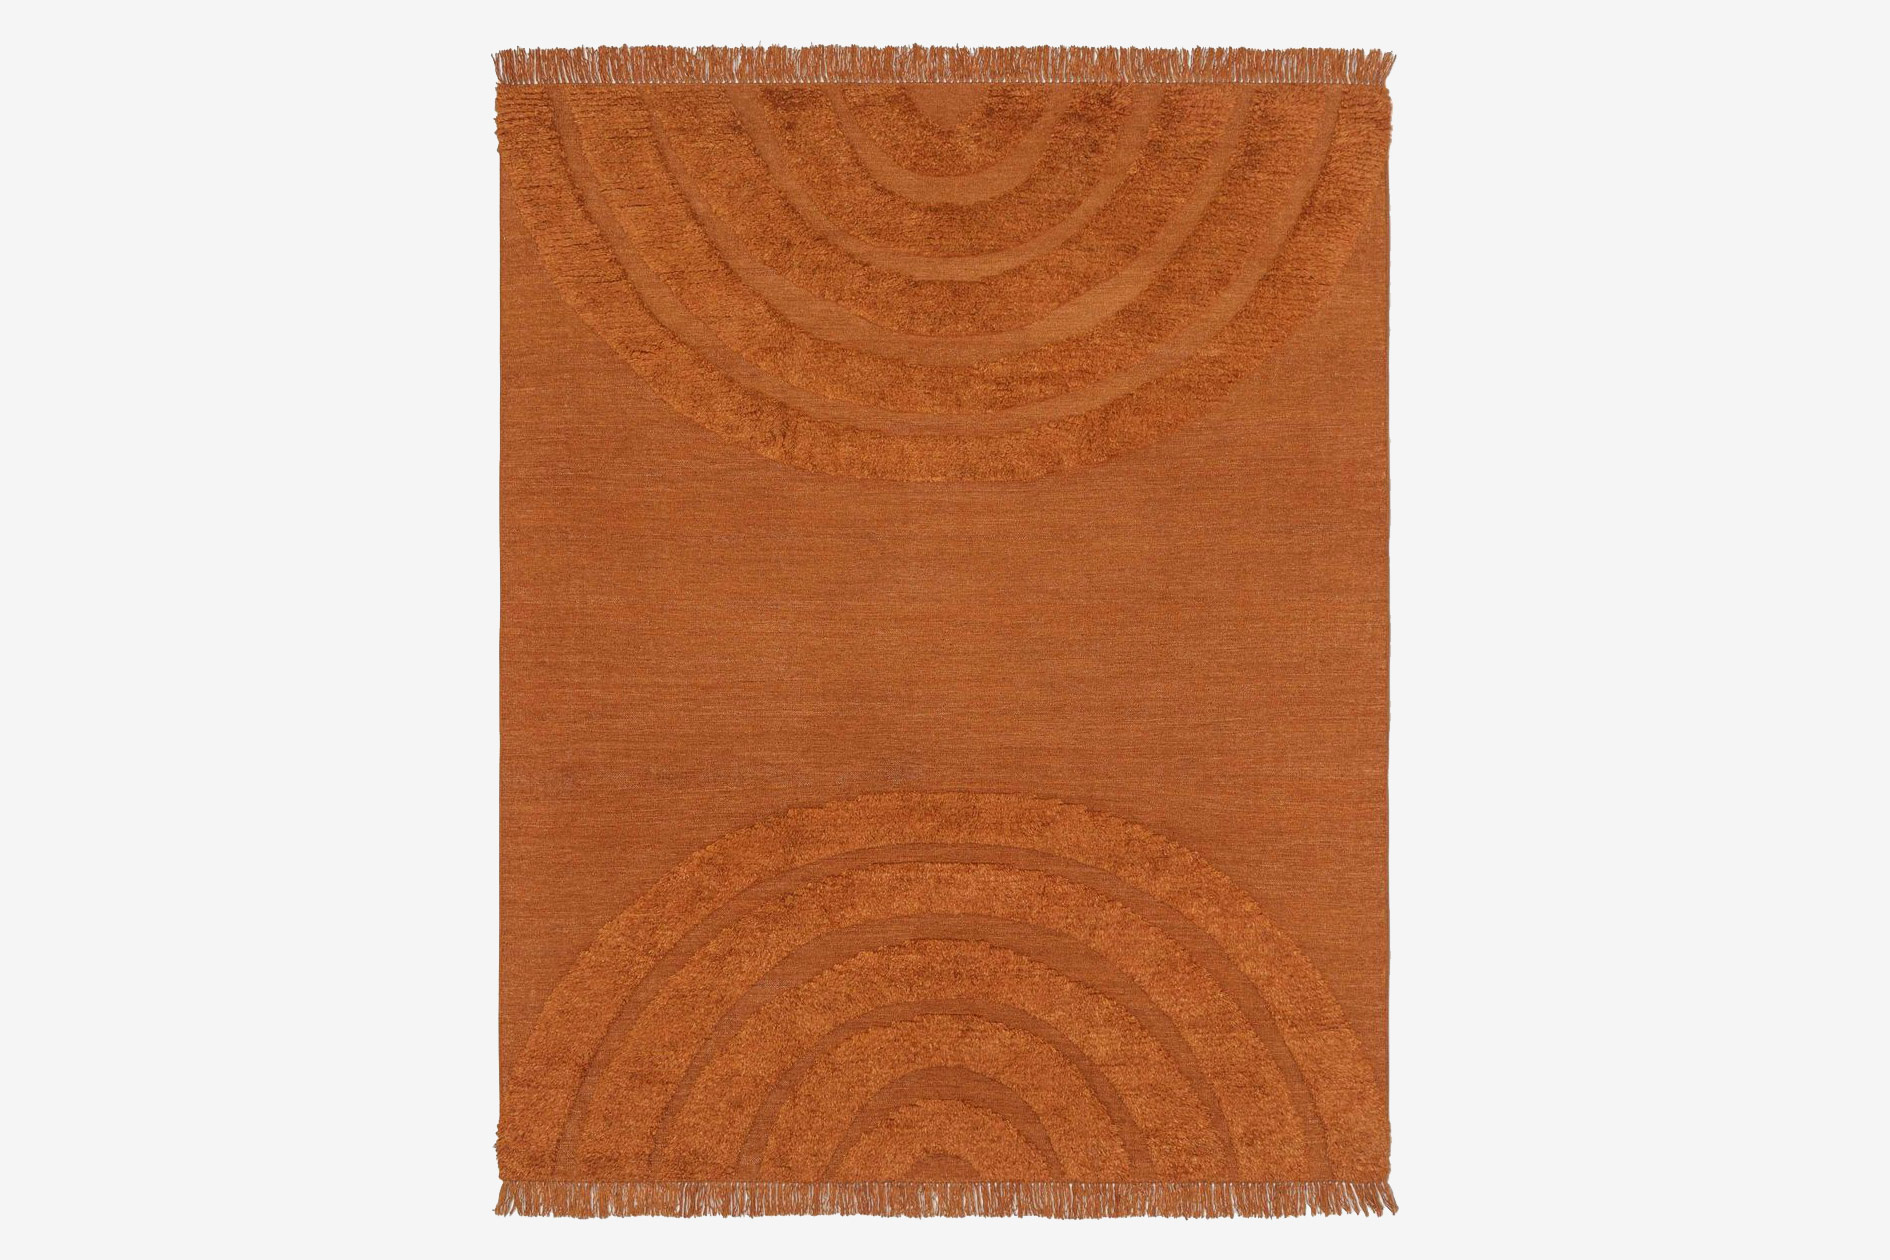 Sarah Sherman Samuel Arches Rug for Lulu & Georgia - 8' x 10'